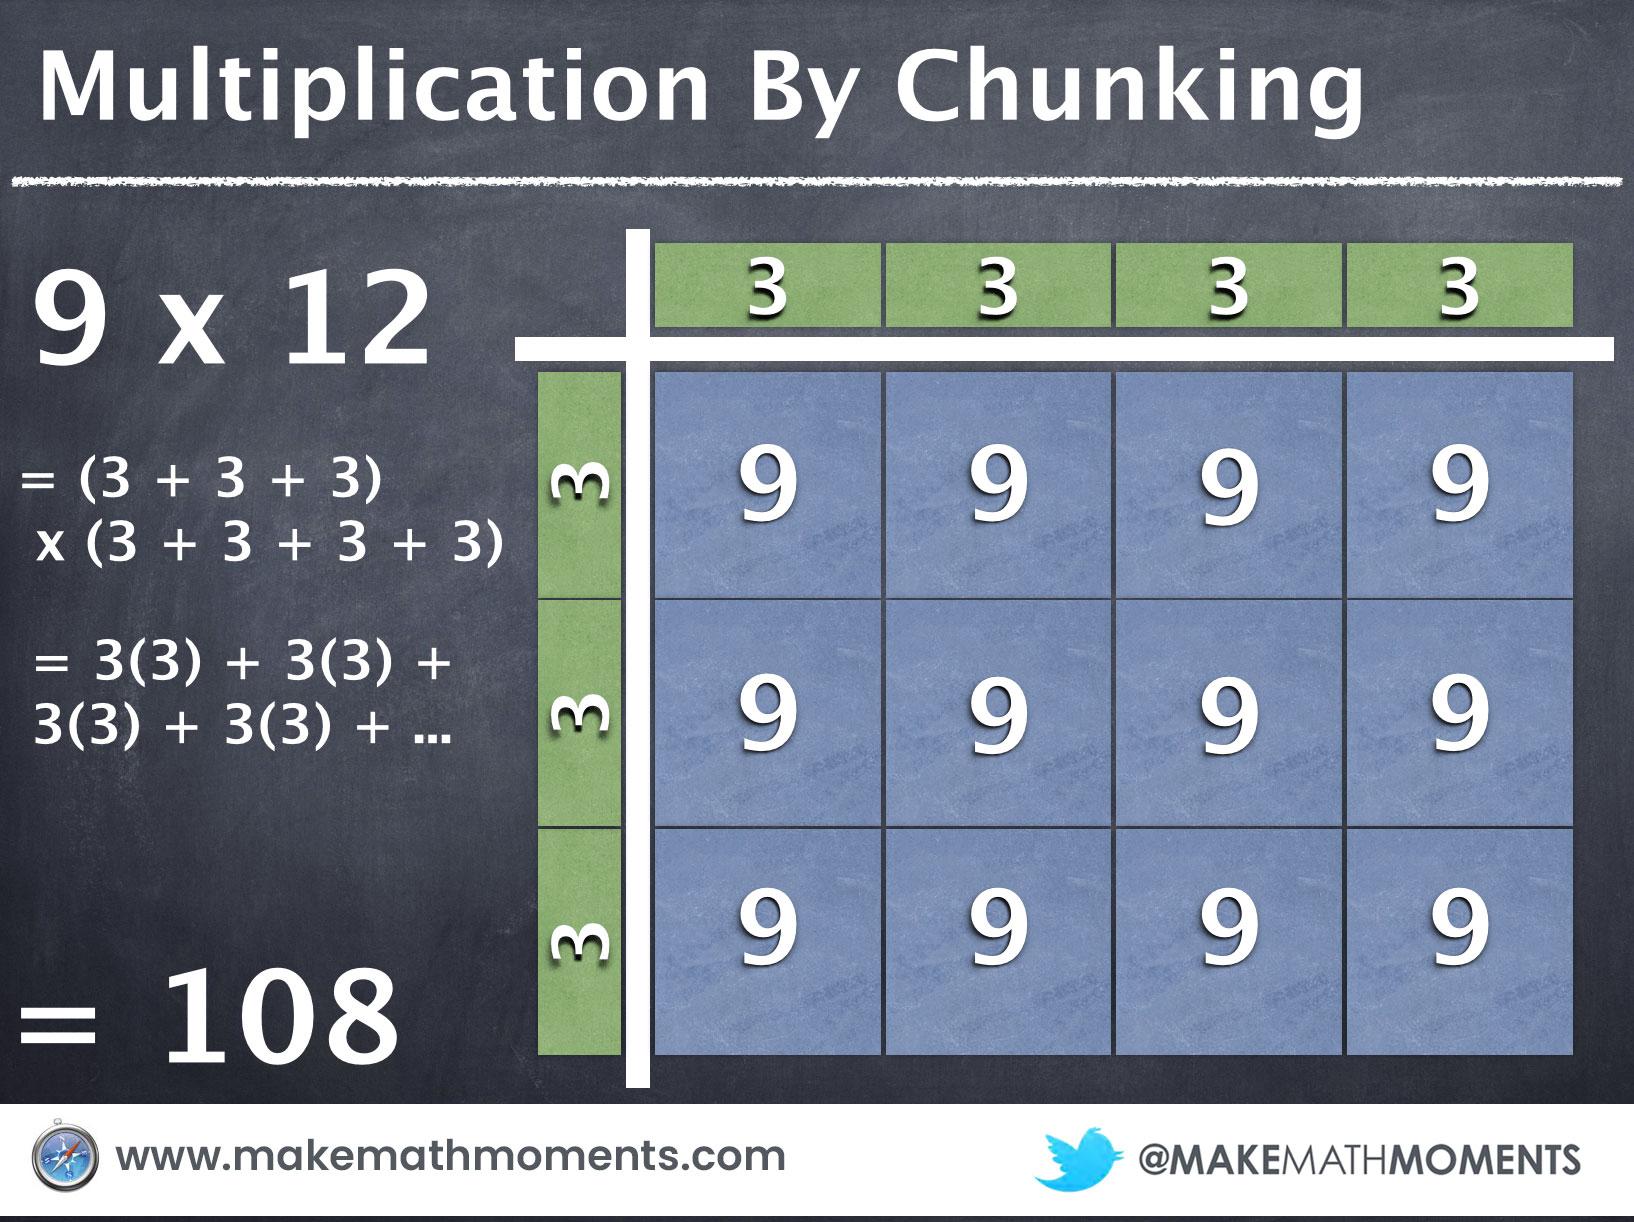 Multiplication By Chunking - 12 x 9 = 3x3 + 3x4